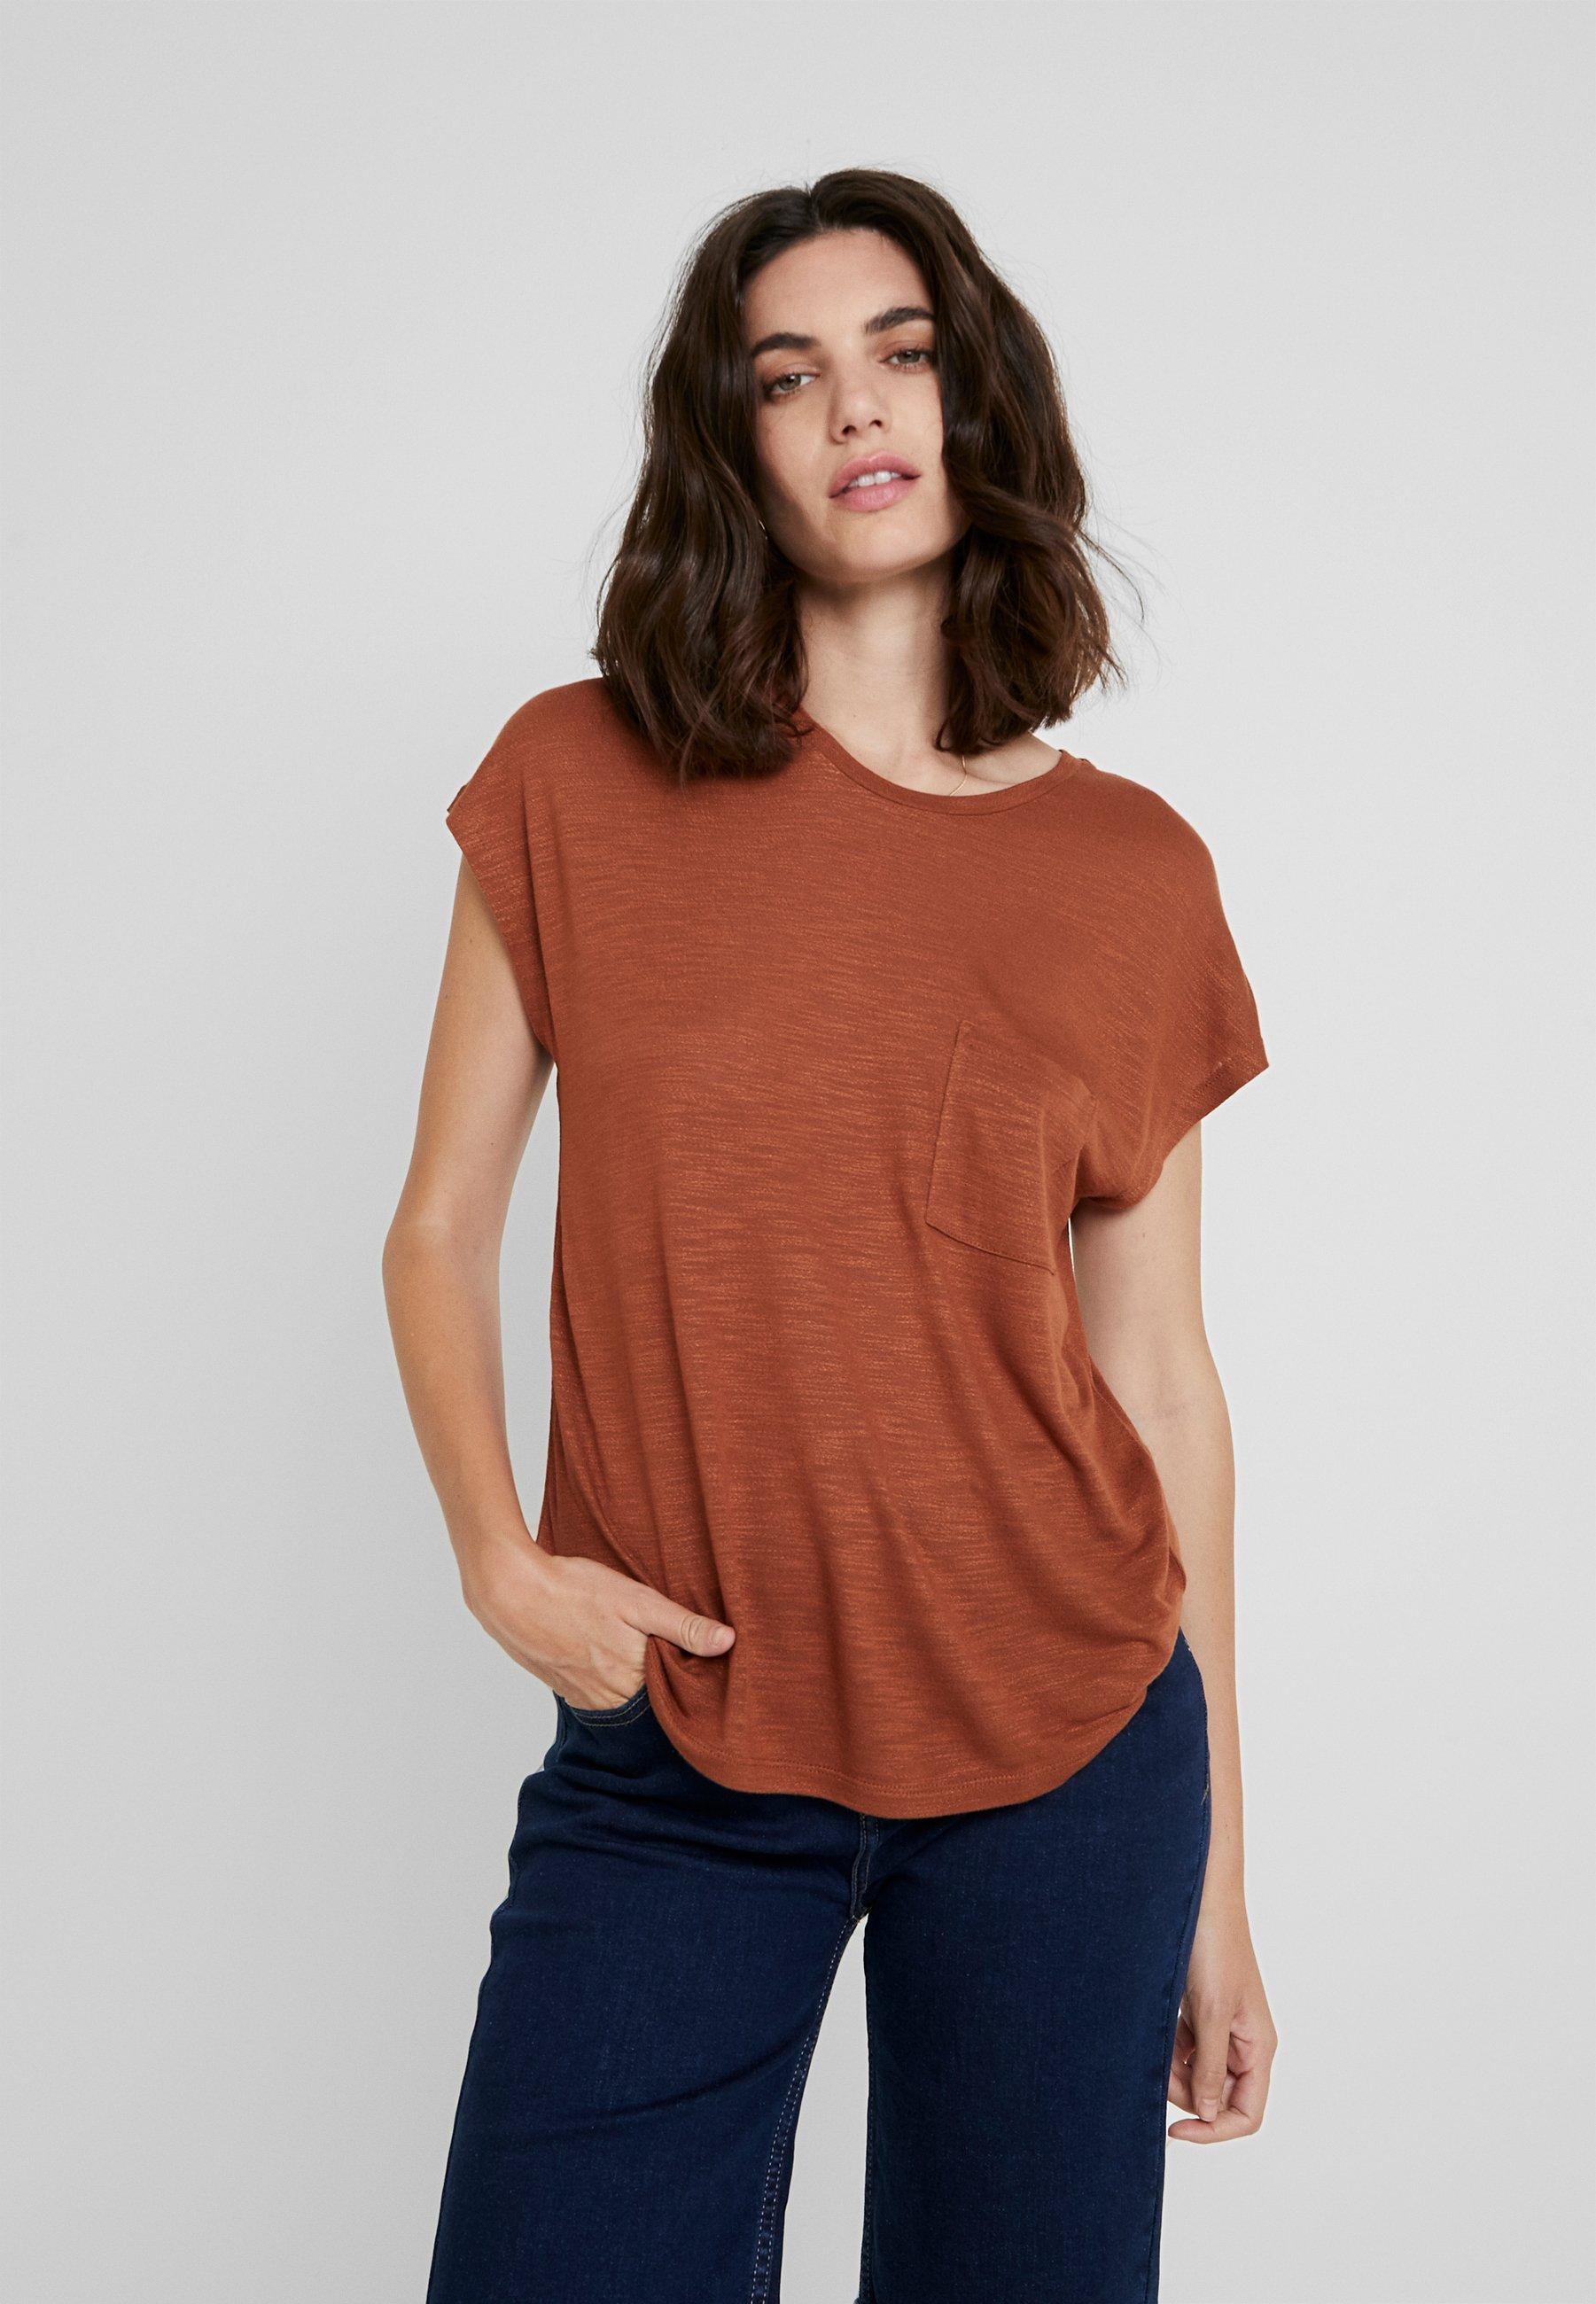 Caramel BasiqueCoffee shirt One More Story T dCtxhsQrB